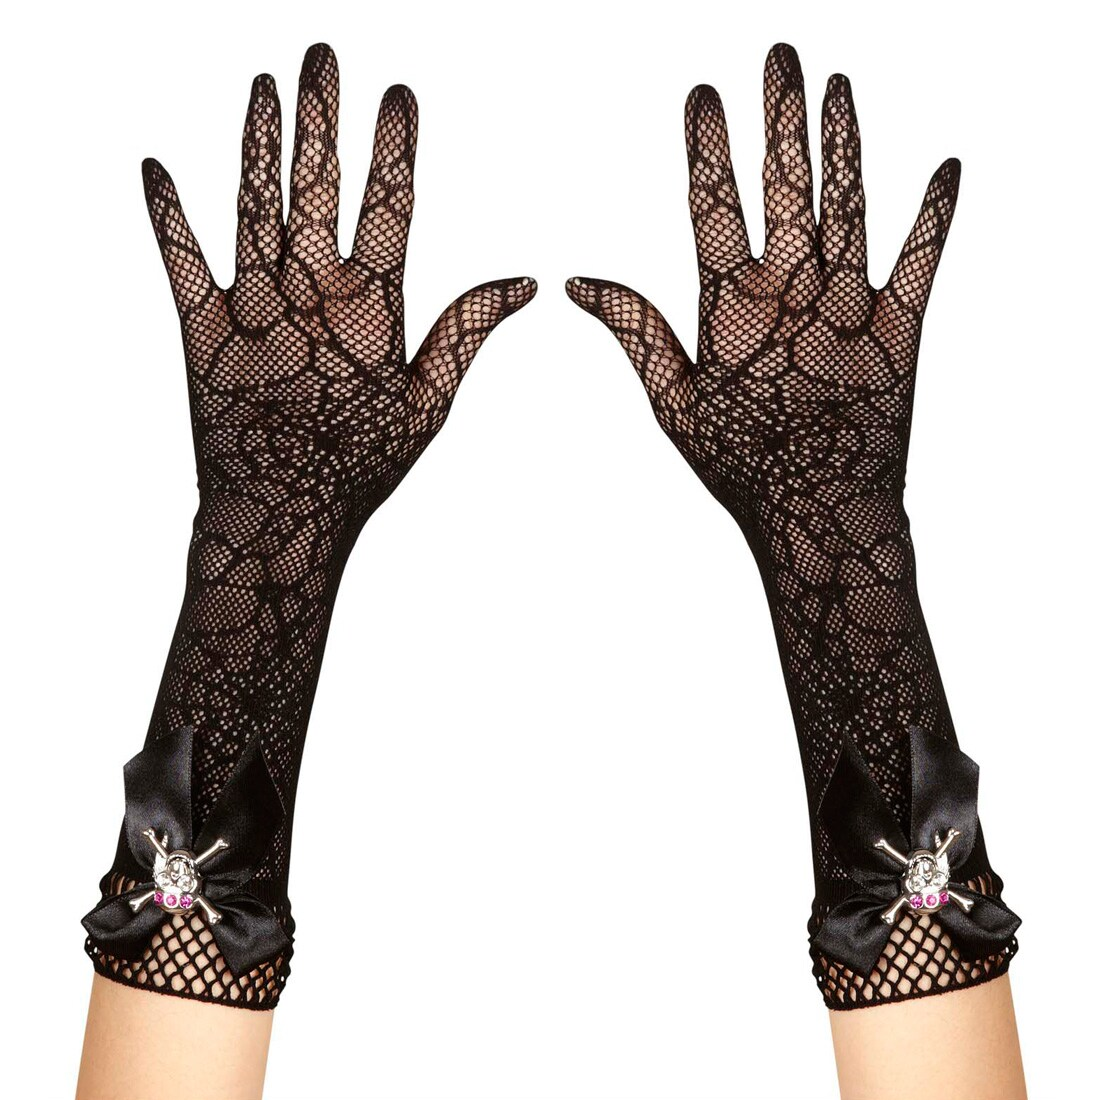 Hexenhandschuhe schwarz lang Fingernägel Accessoire Halloween Hexe